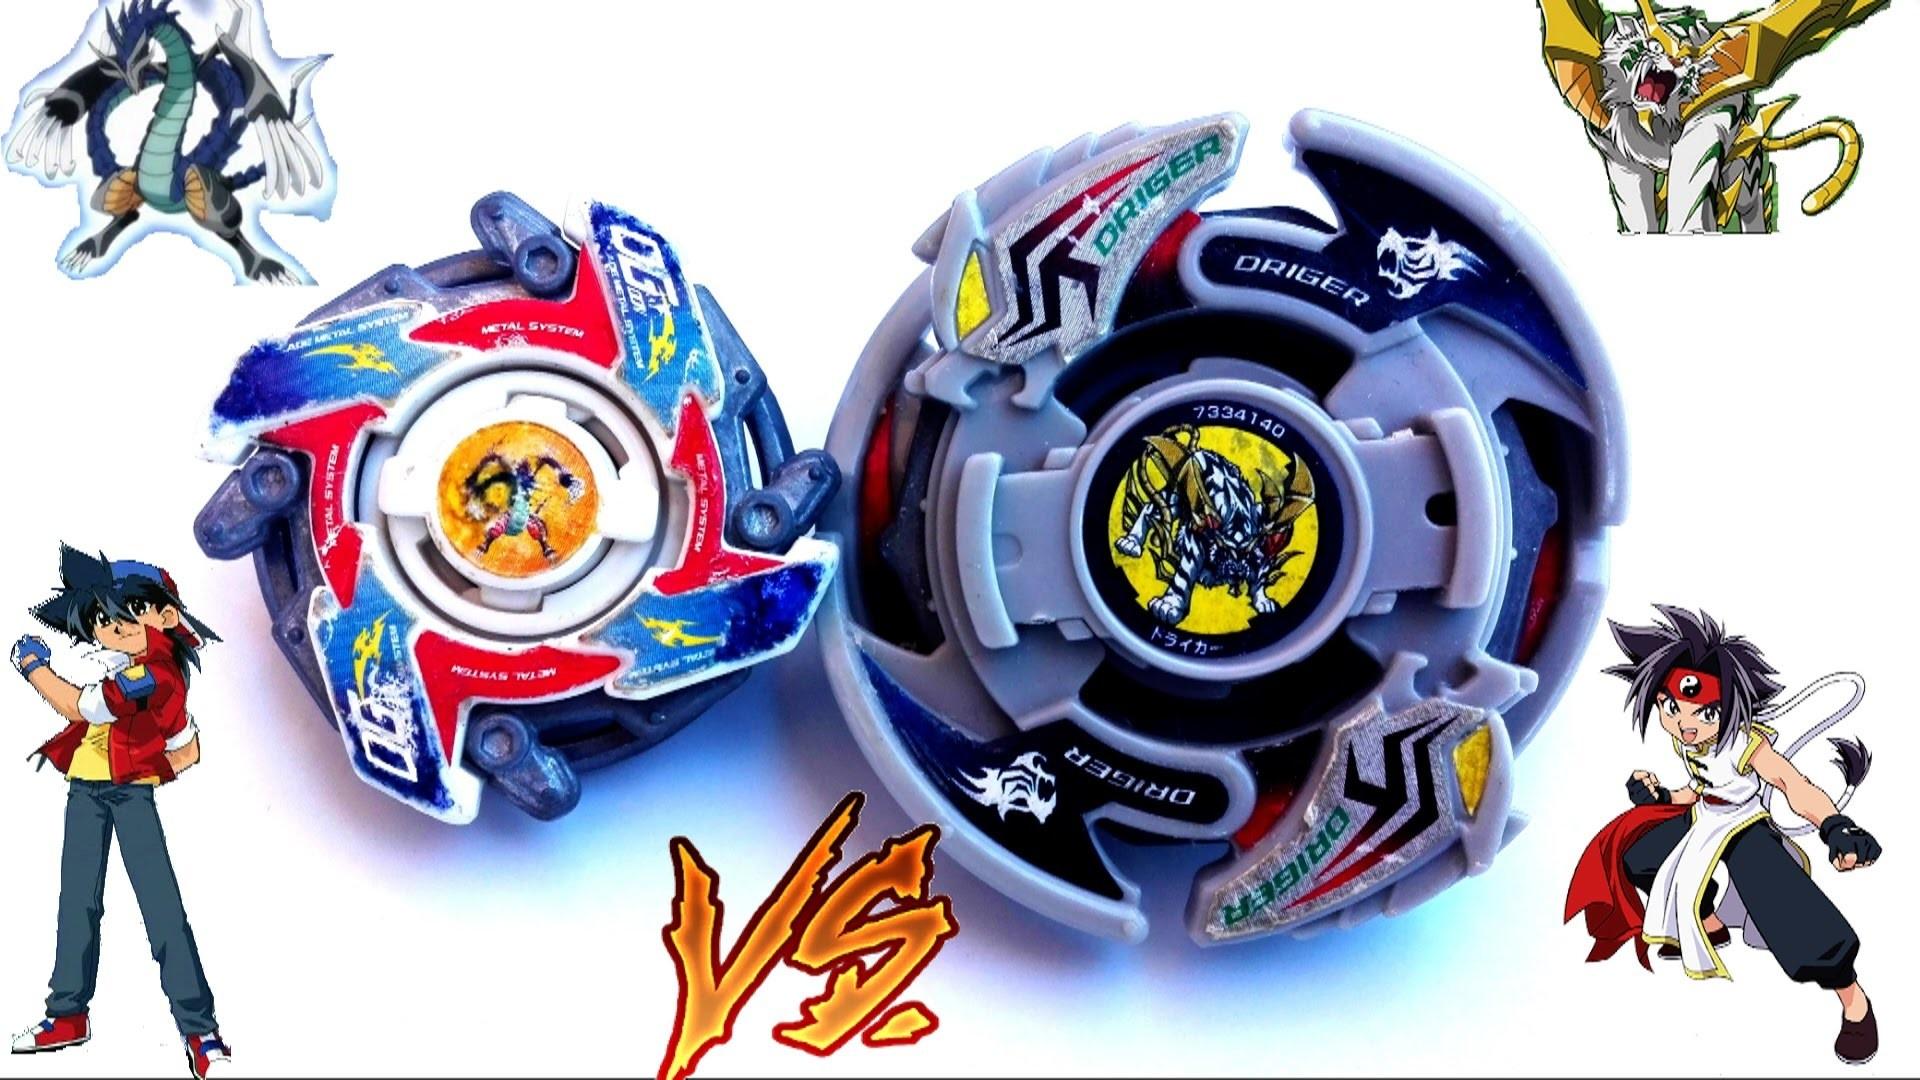 Dragoon MS vs Driger V2   Tyson vs Ray   Epic Beyblade Battle   Slowmotion    HMS vs Plastic – YouTube